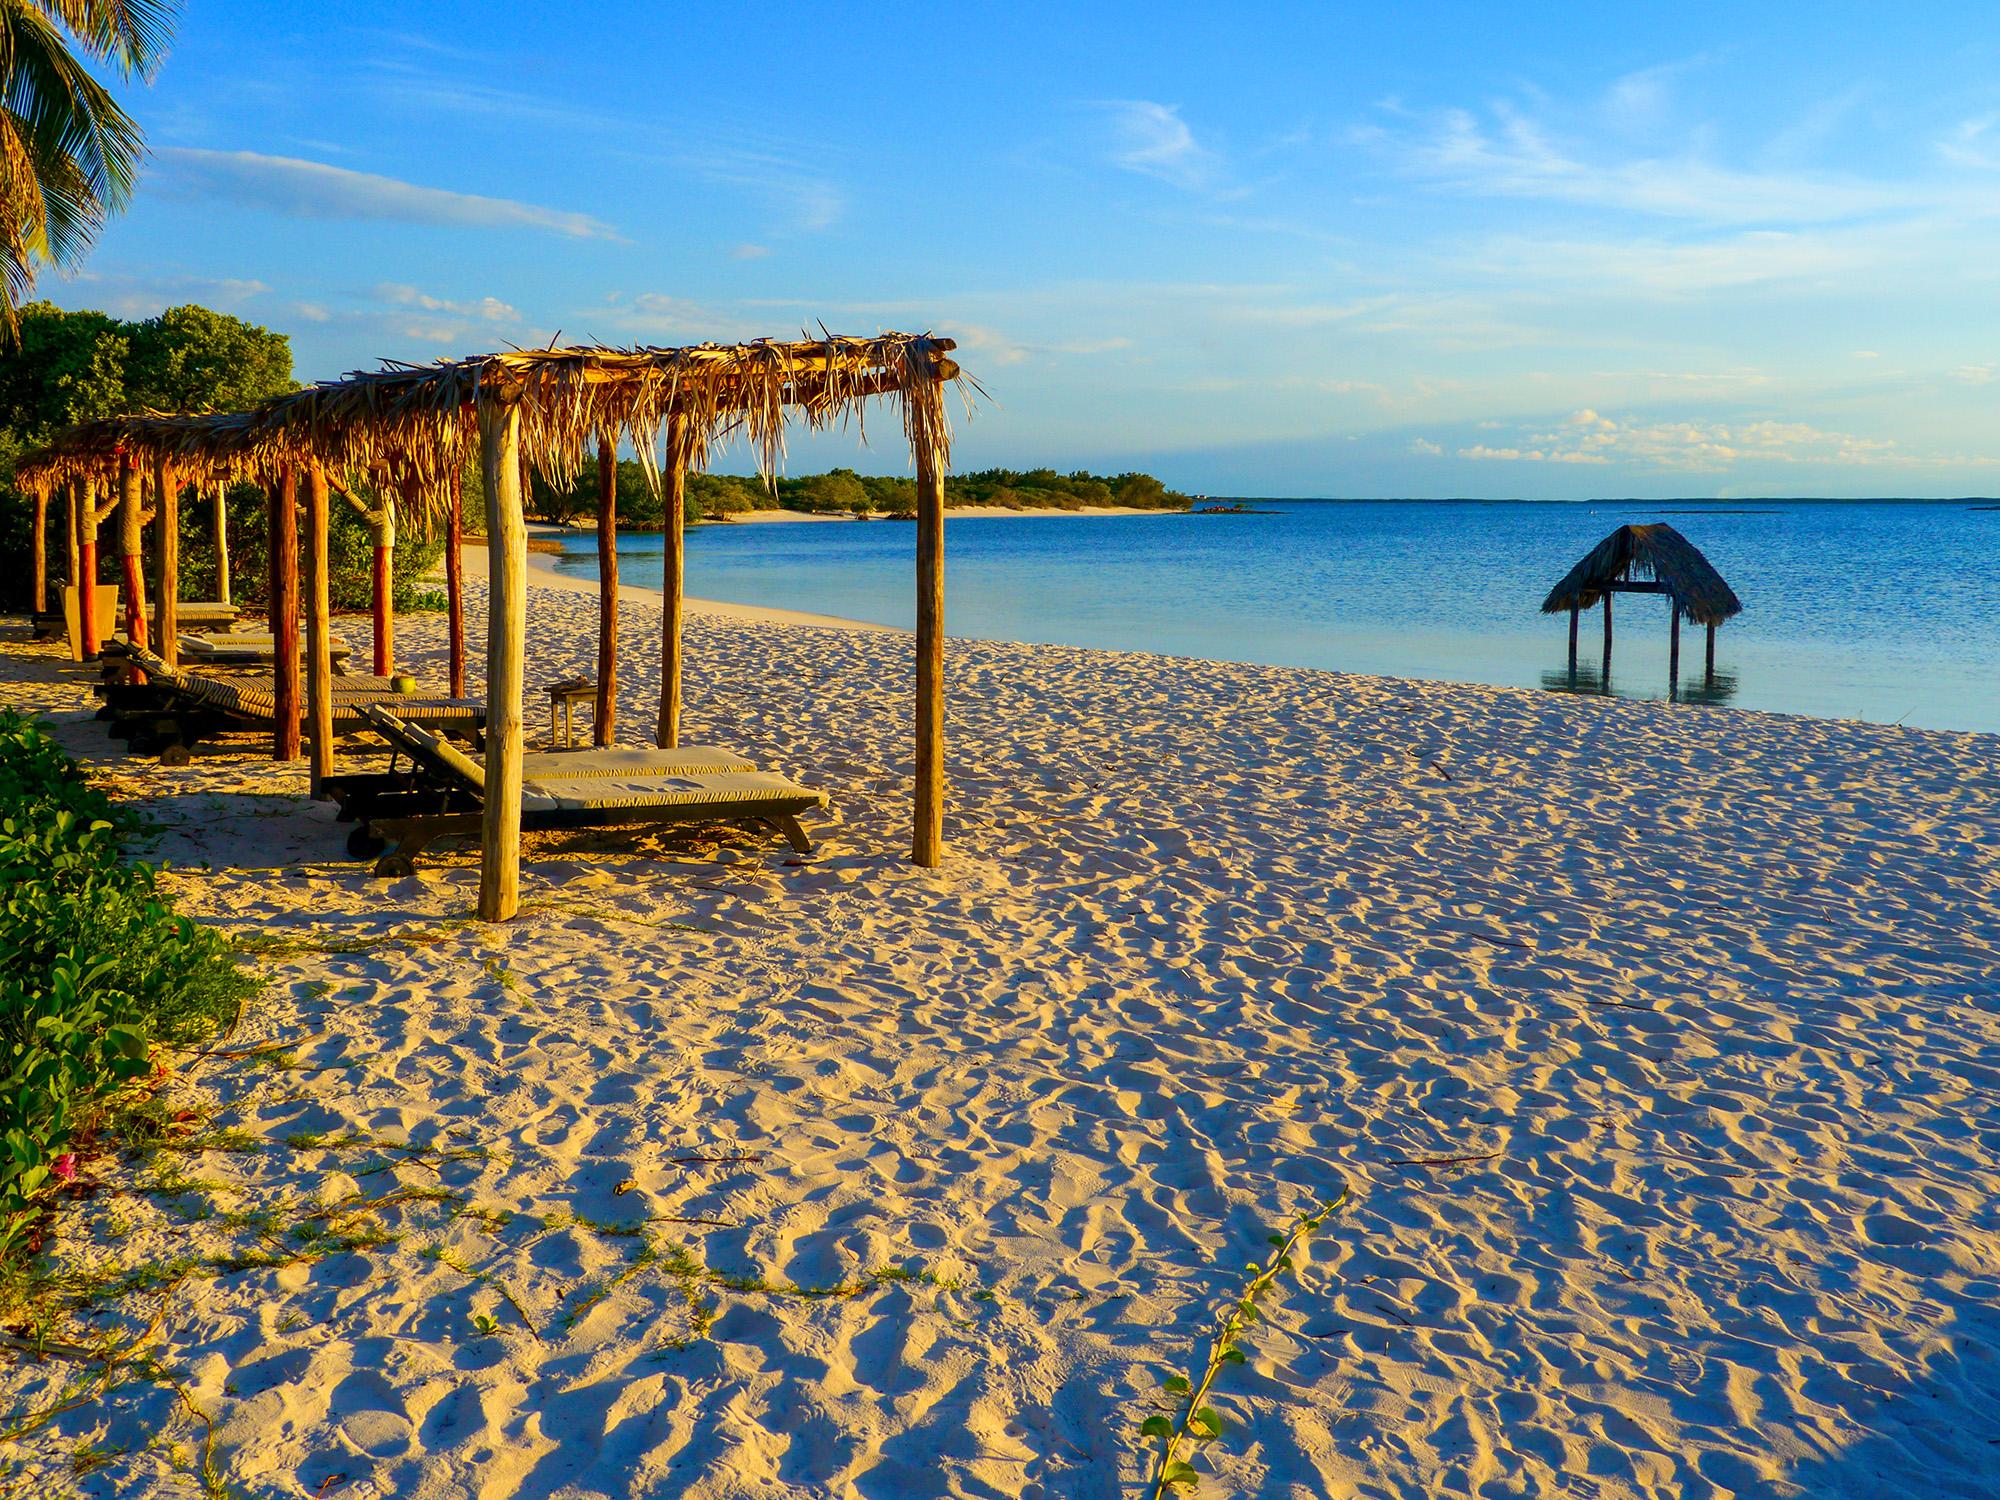 Melia Buenavista sunset beach. Photo by Johanna Read TravelEater.net.jpg